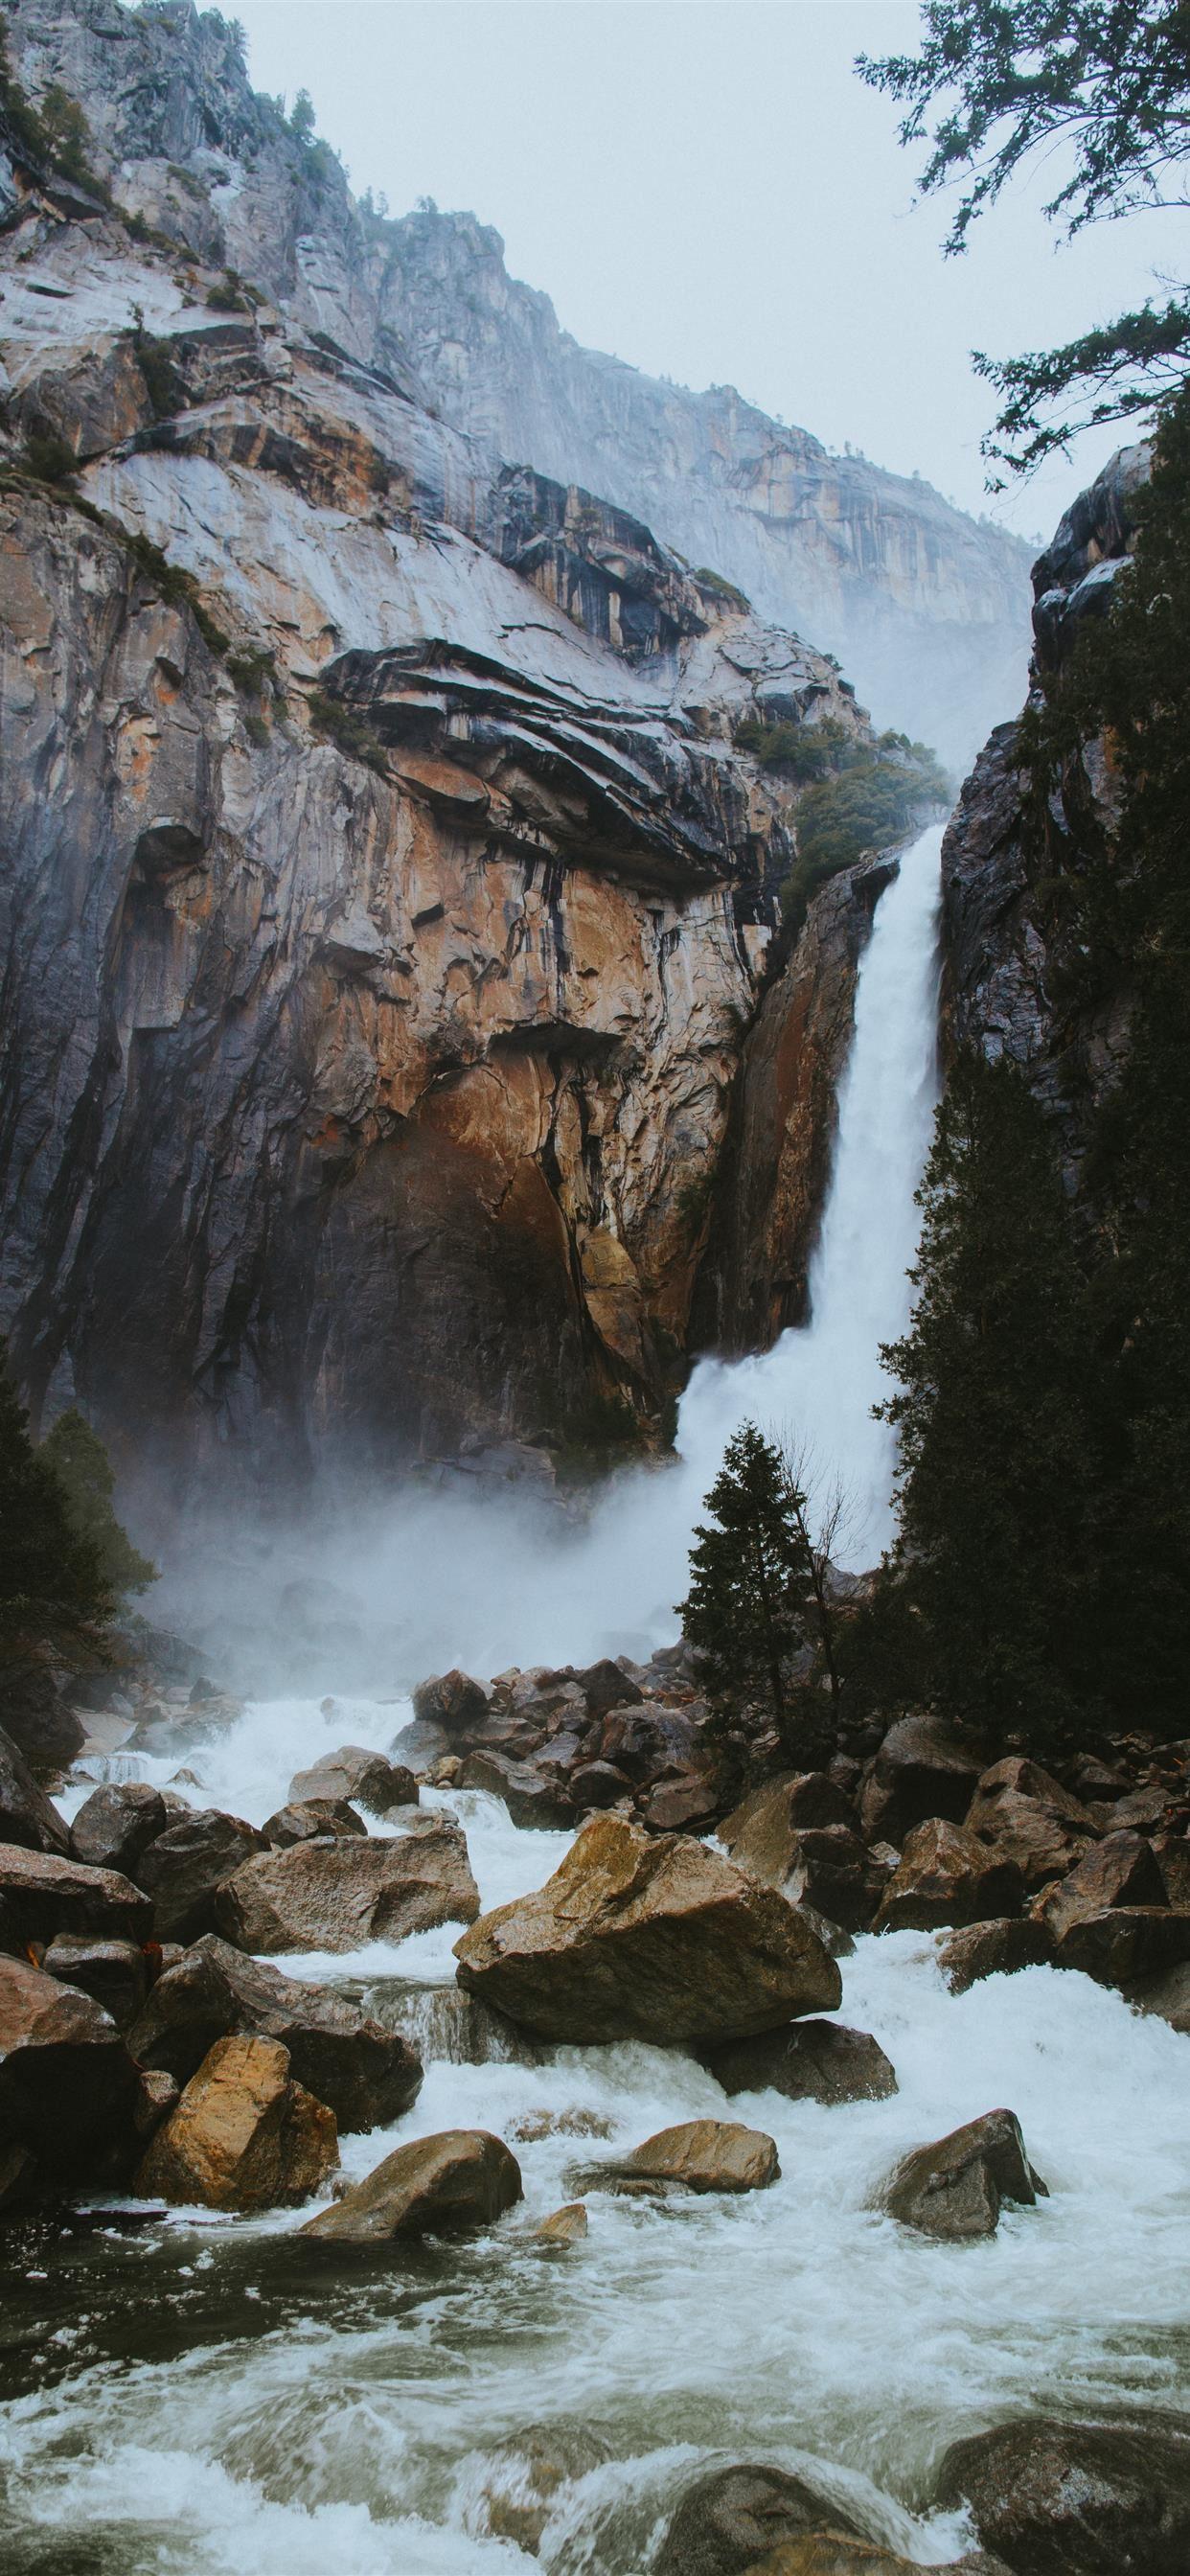 Waterfall Iphone X Wallpaper Download Iphone Wallpapers Ipad